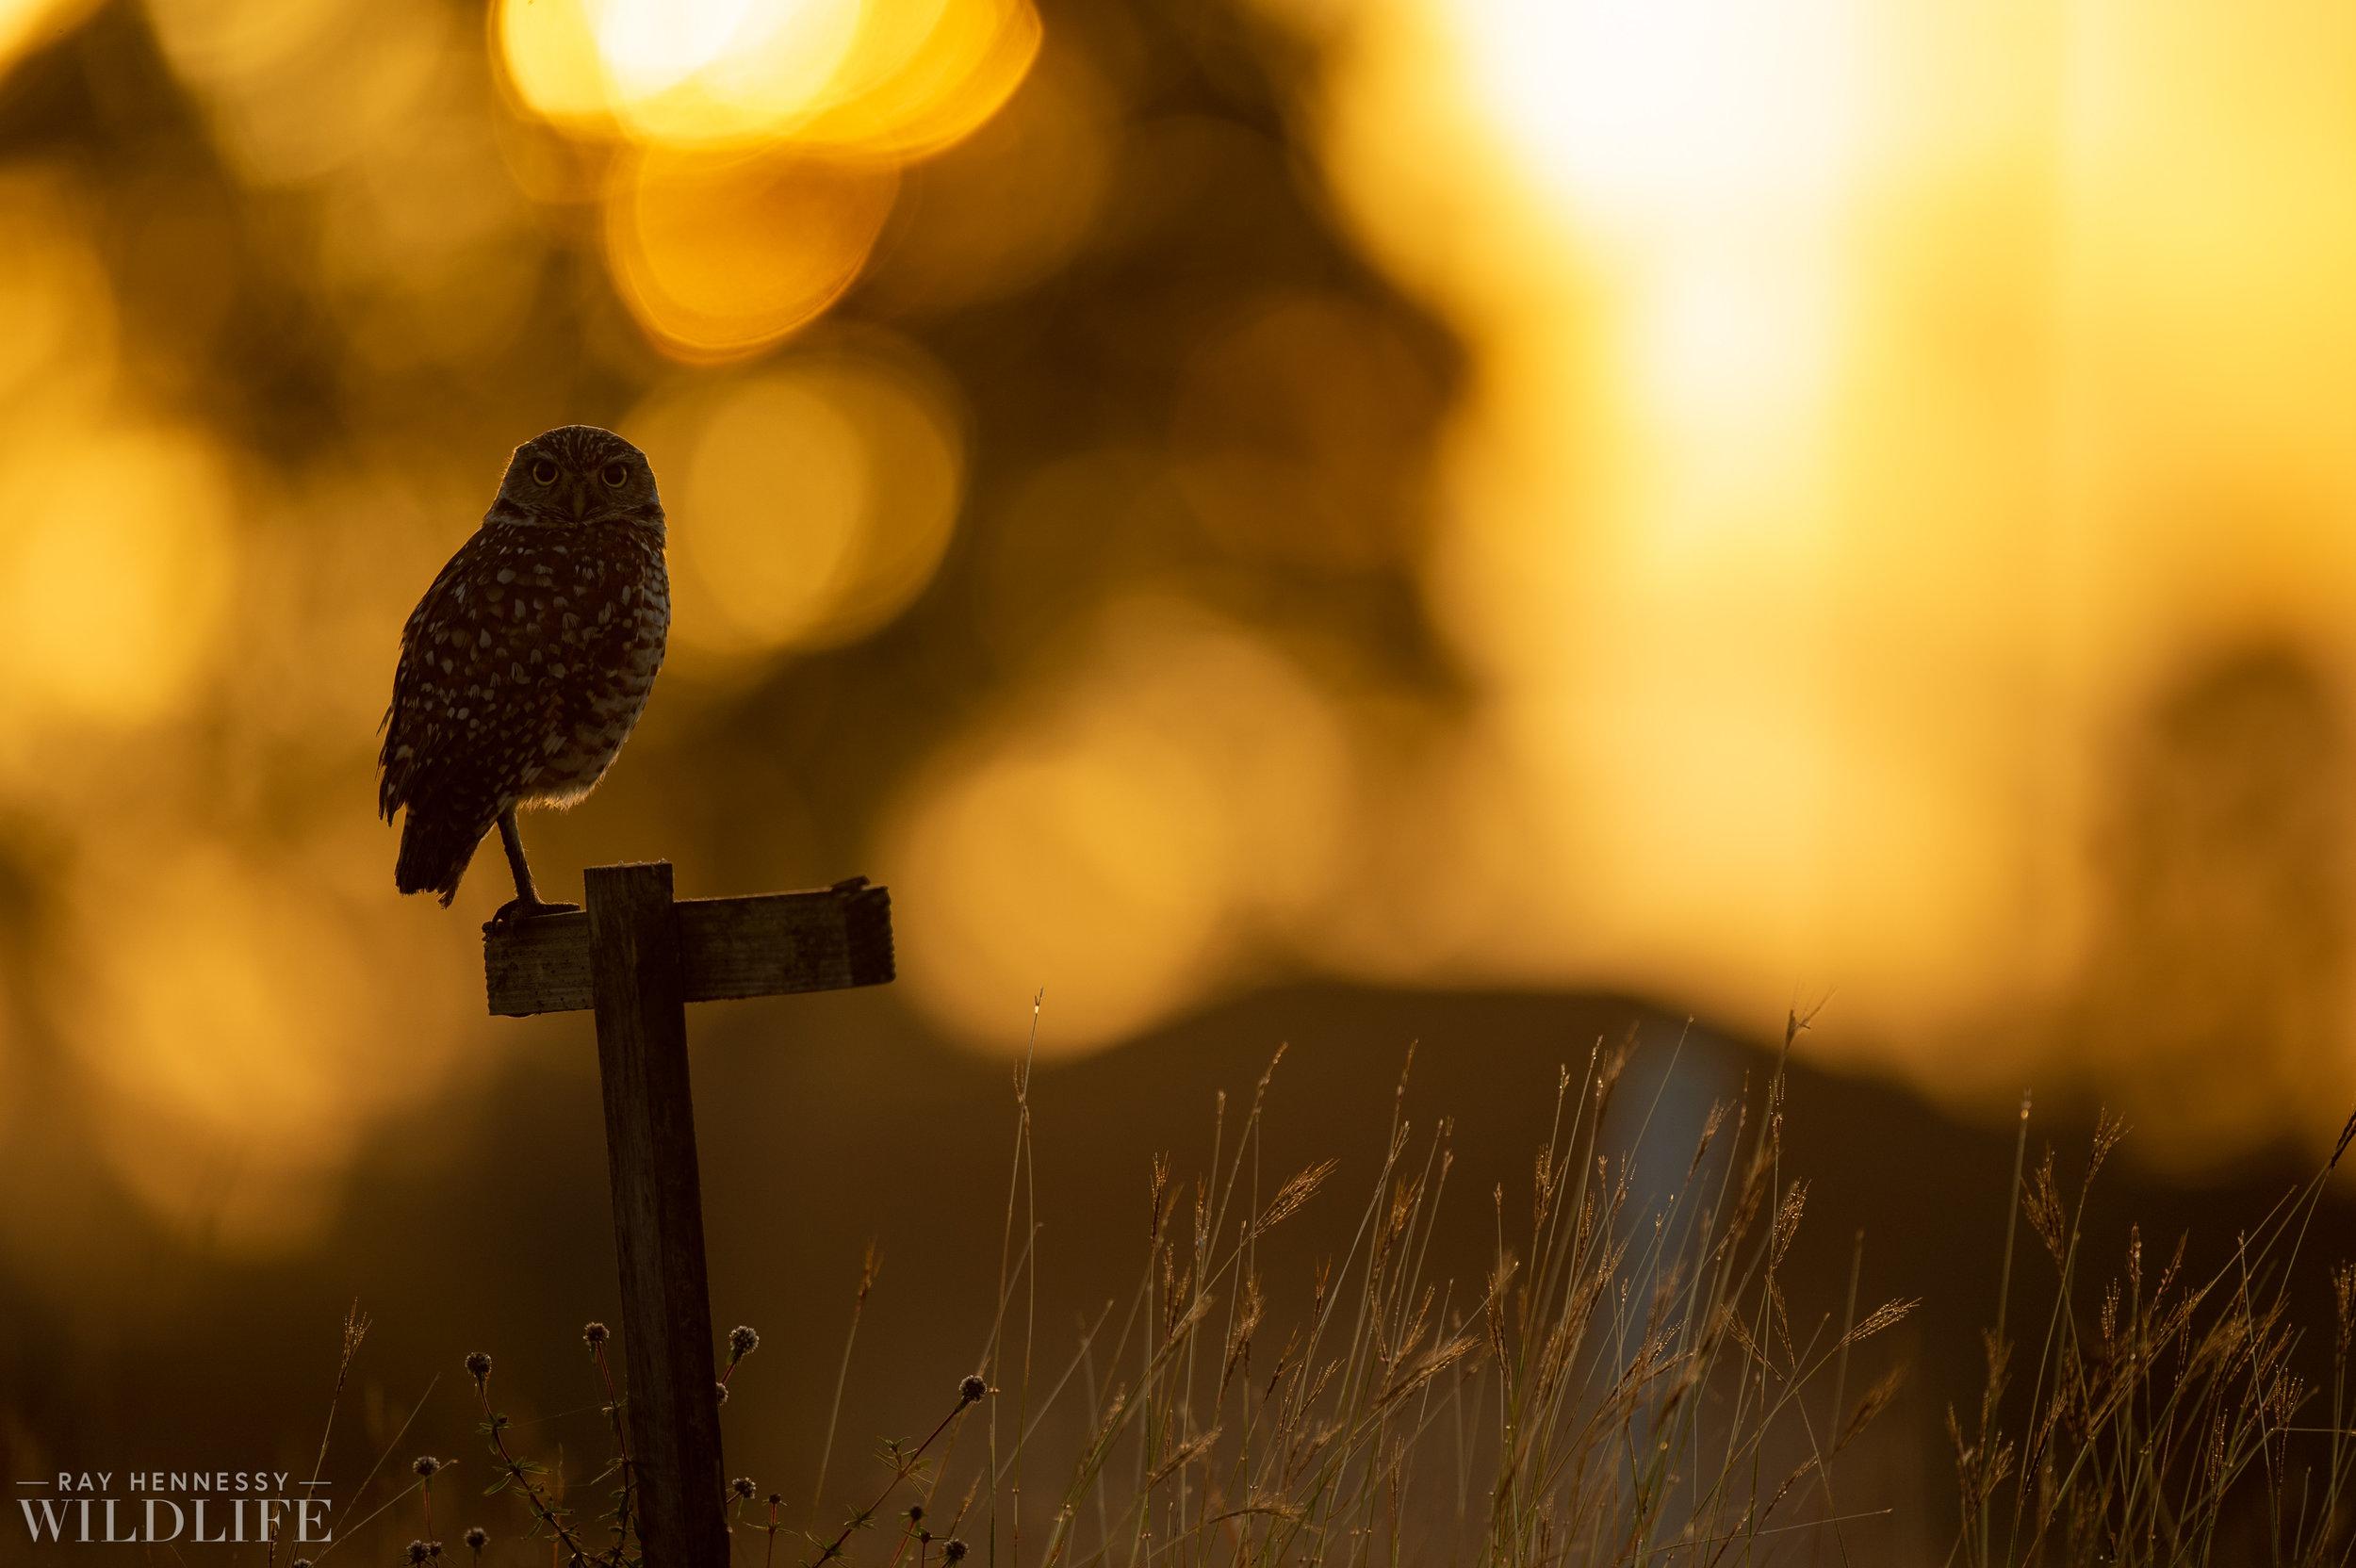 003_burrowing-owls-blue-heron-florida.jpg